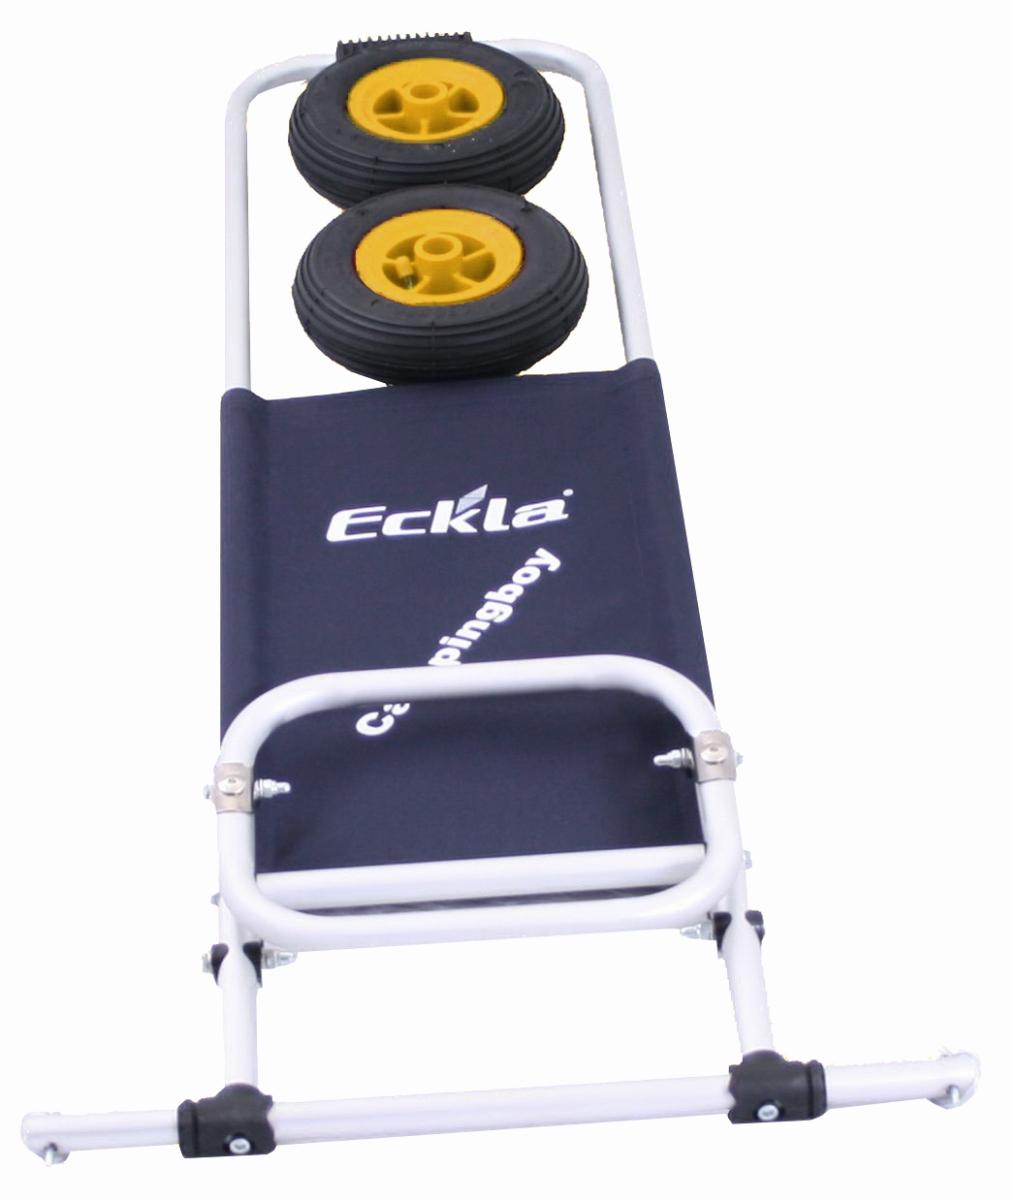 Eckla Transportroller Camping Boy